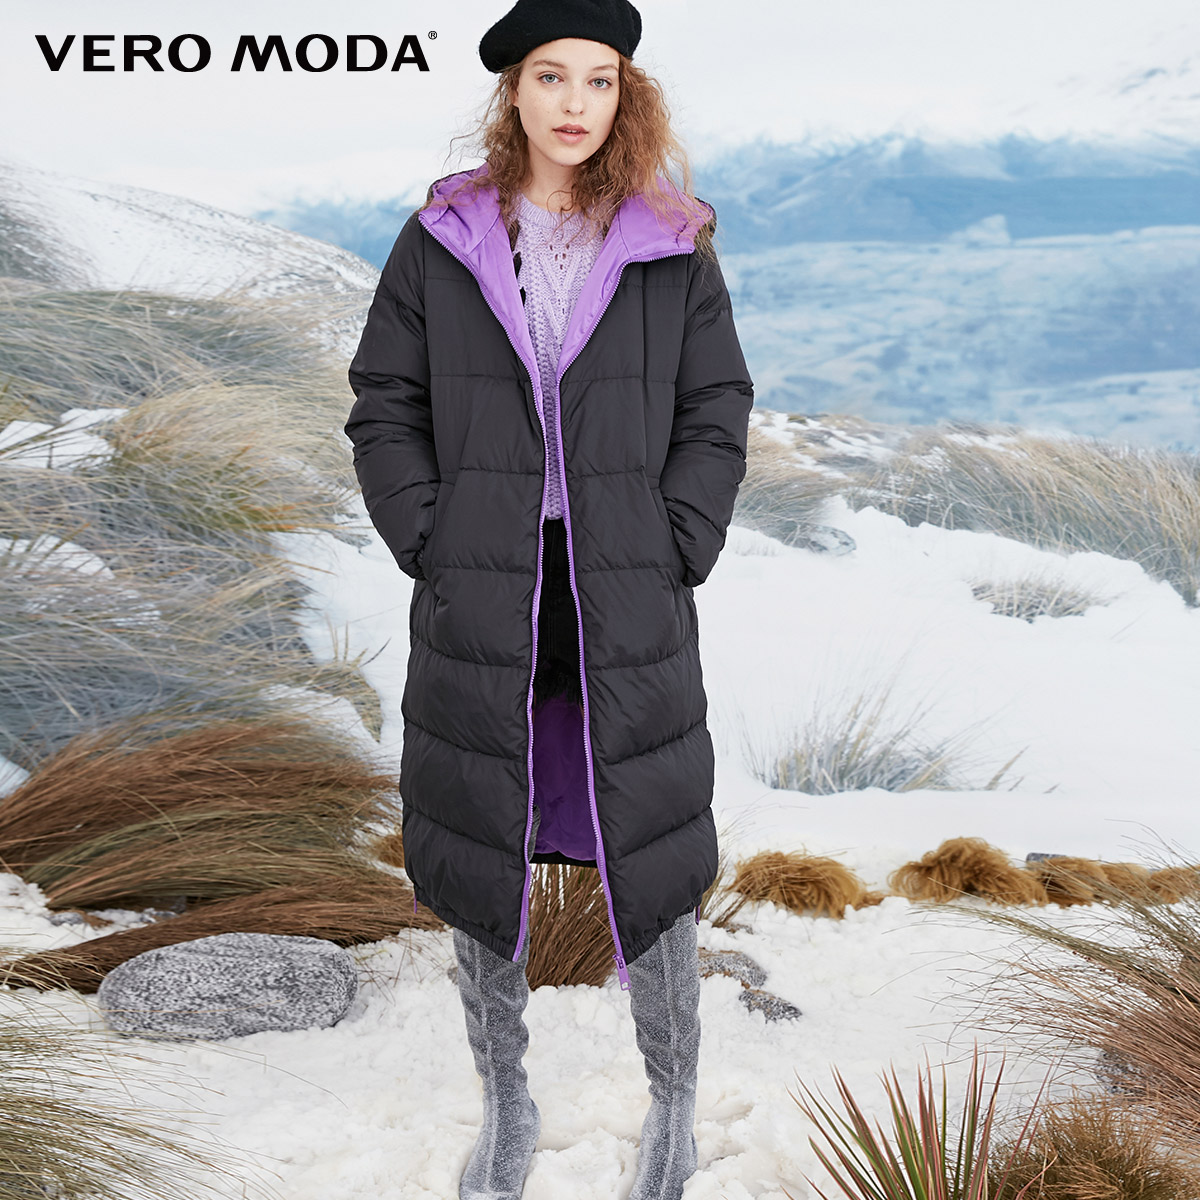 Vero moda 여성의 흰색 오리 후드 긴 두꺼운 다운 재킷  318412545-에서다운 코트부터 여성 의류 의  그룹 1